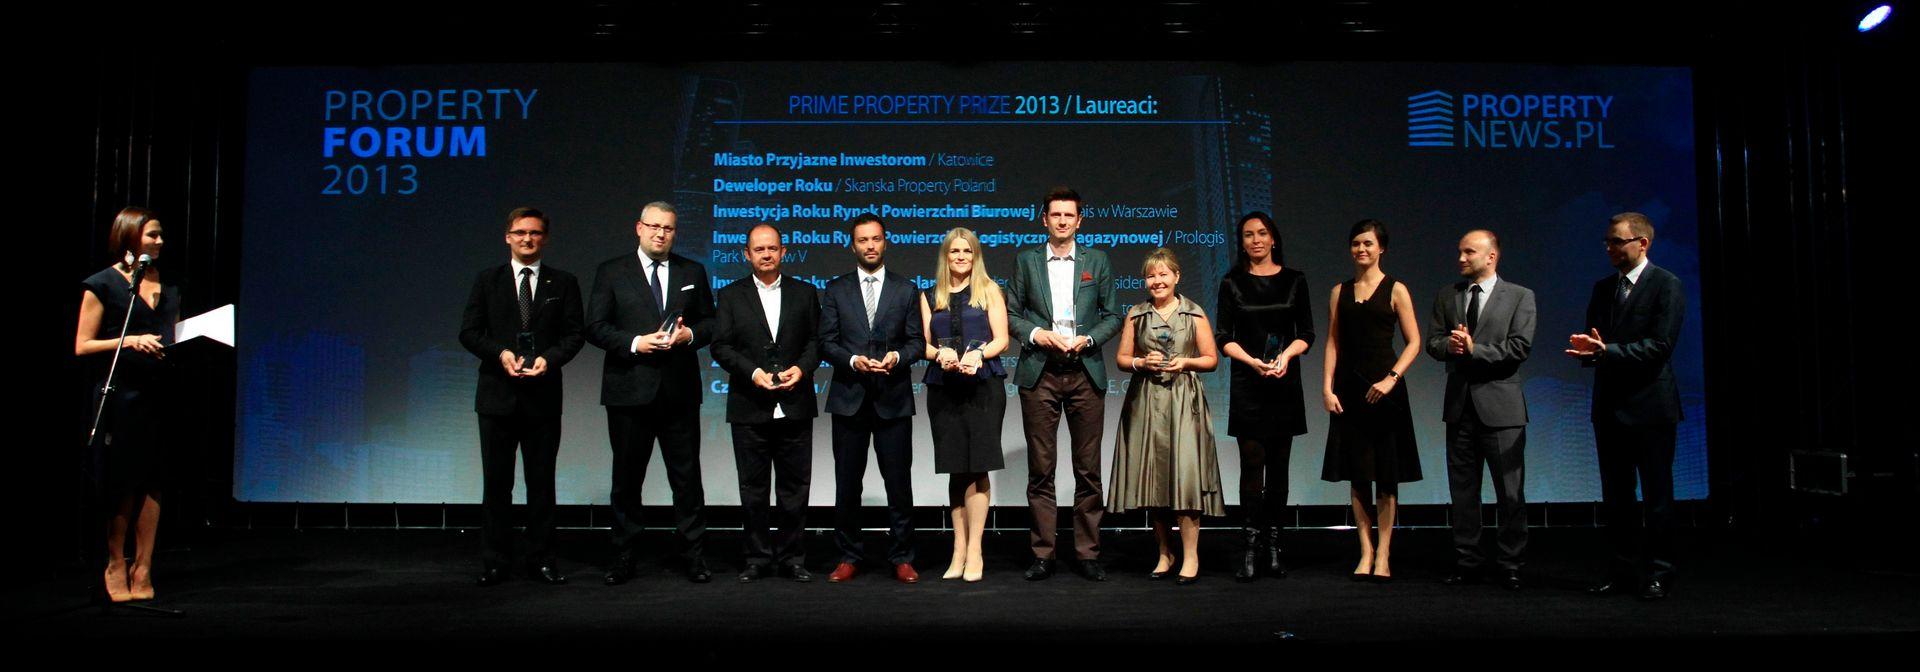 [Katowice] Nagrody Prime Property Prize wręczone podczas Property Forum 2013